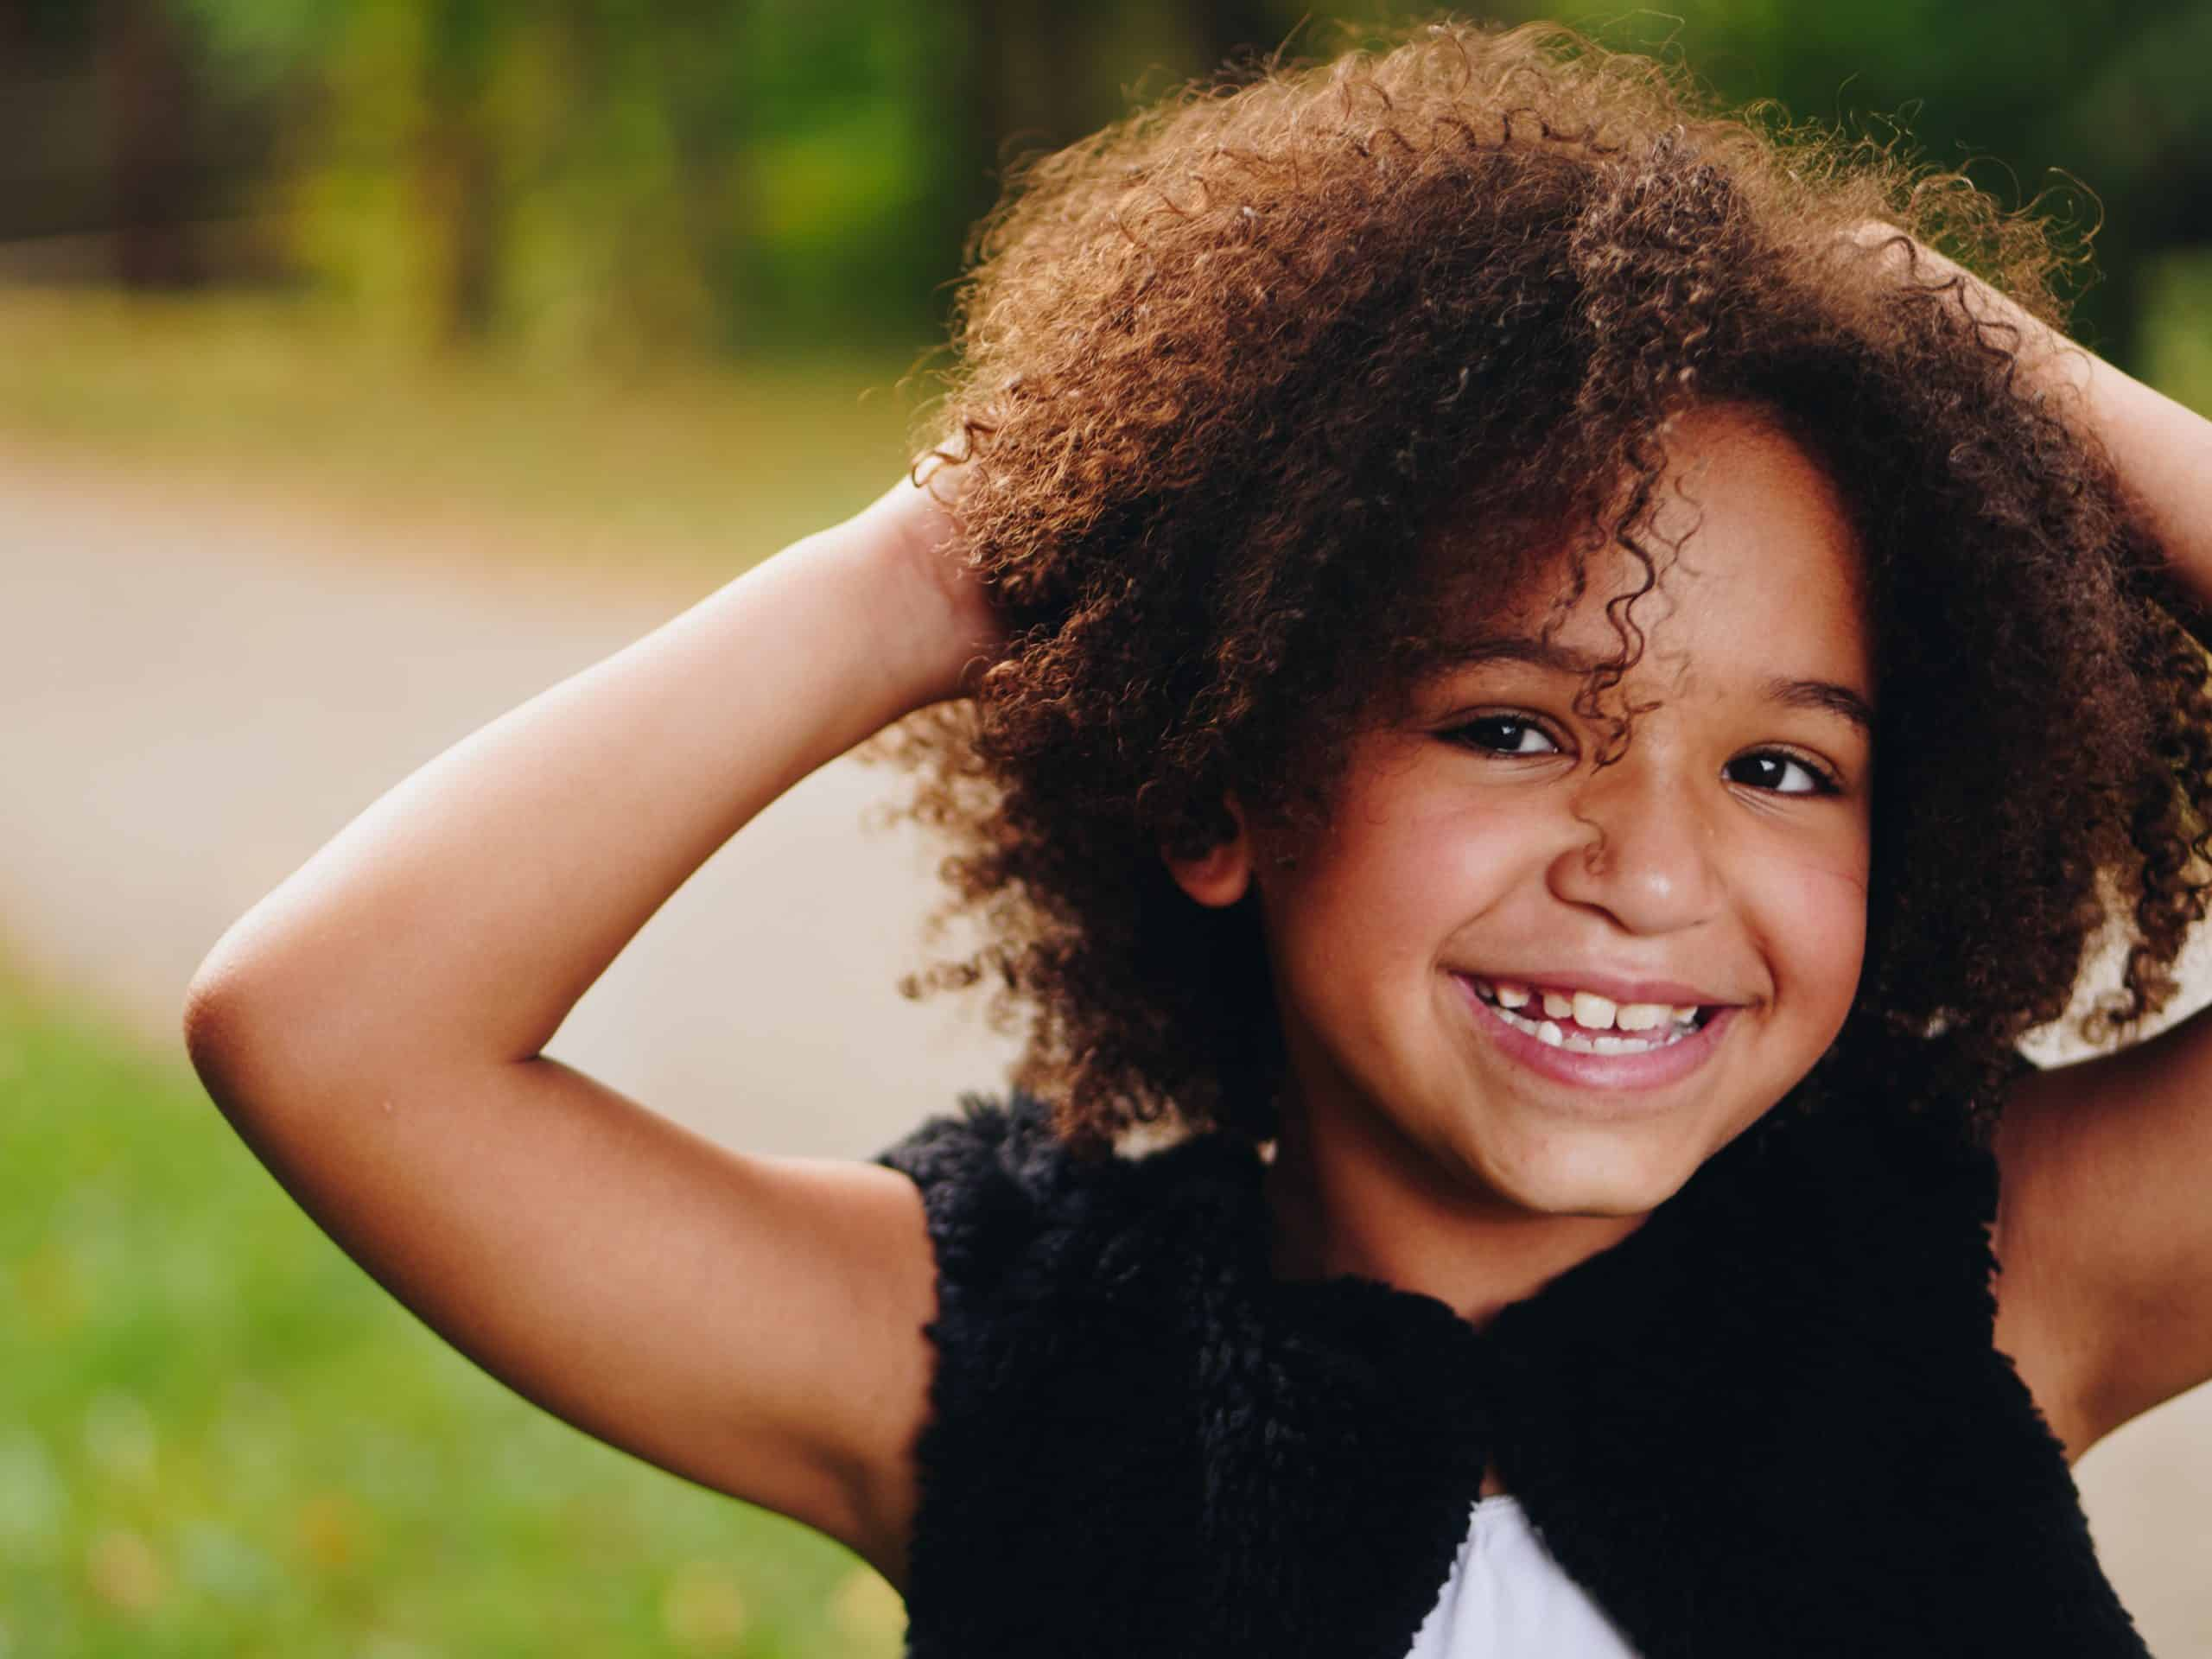 Natural kids hairstyles